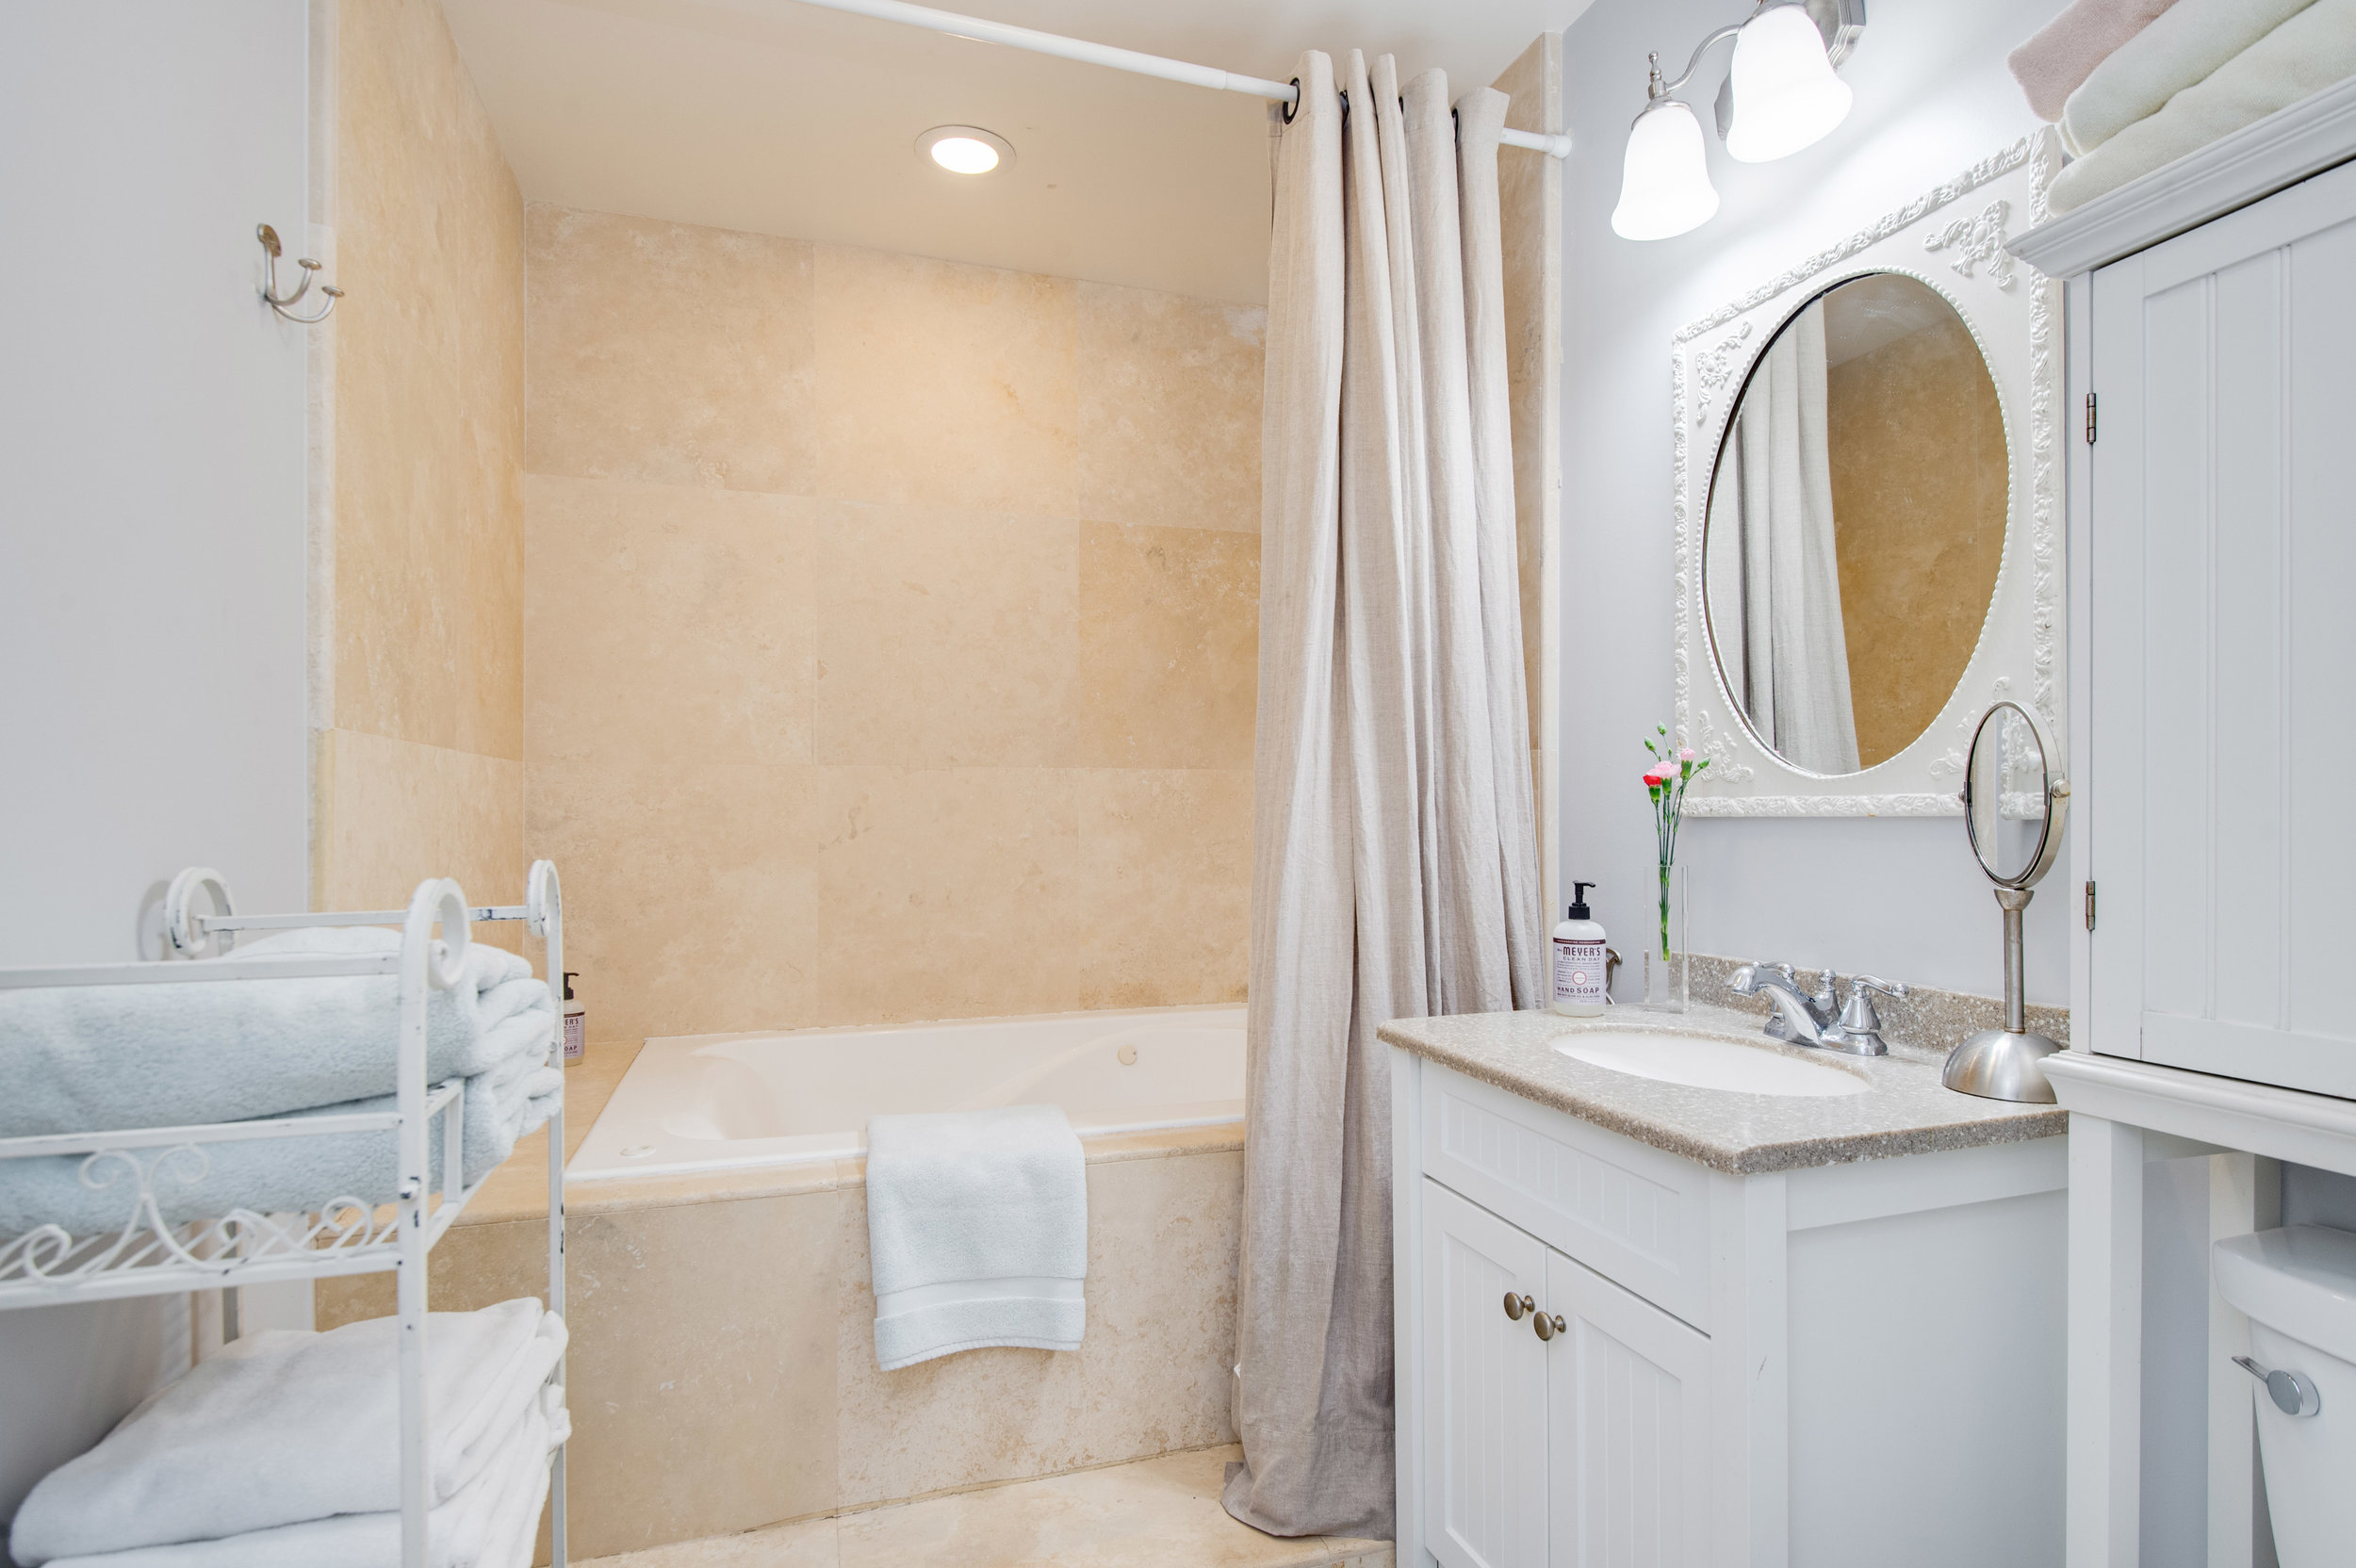 009 Bathroom 3950 Las Flores For Sale Lease The Malibu Life Team Luxury Real Estate.jpg